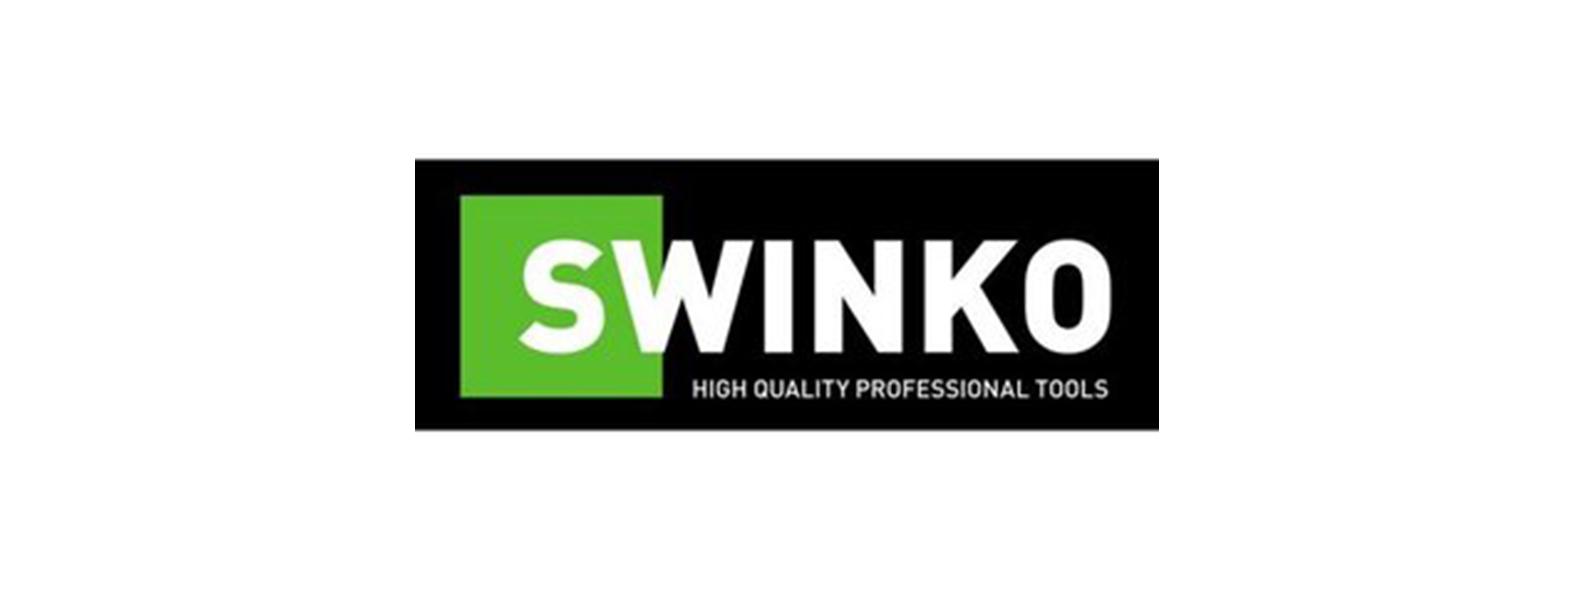 8713265000006-logo-swinko.jpg